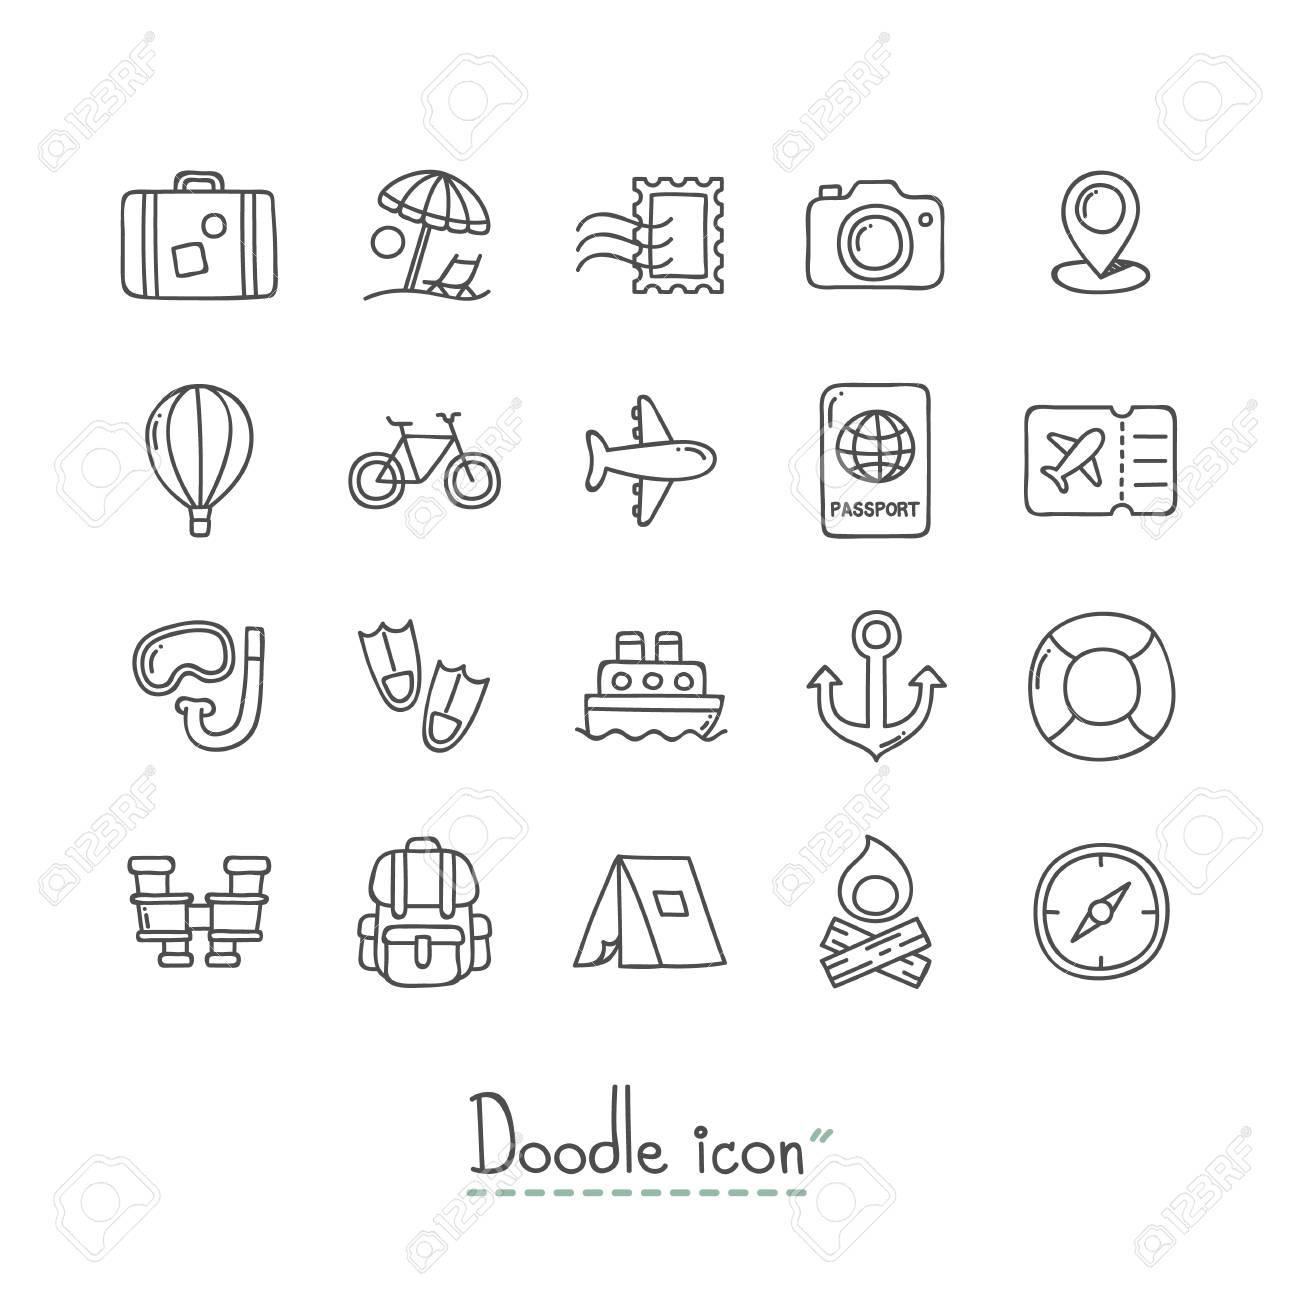 Hand Drawn travel Doodle Icon Set. - 96597111